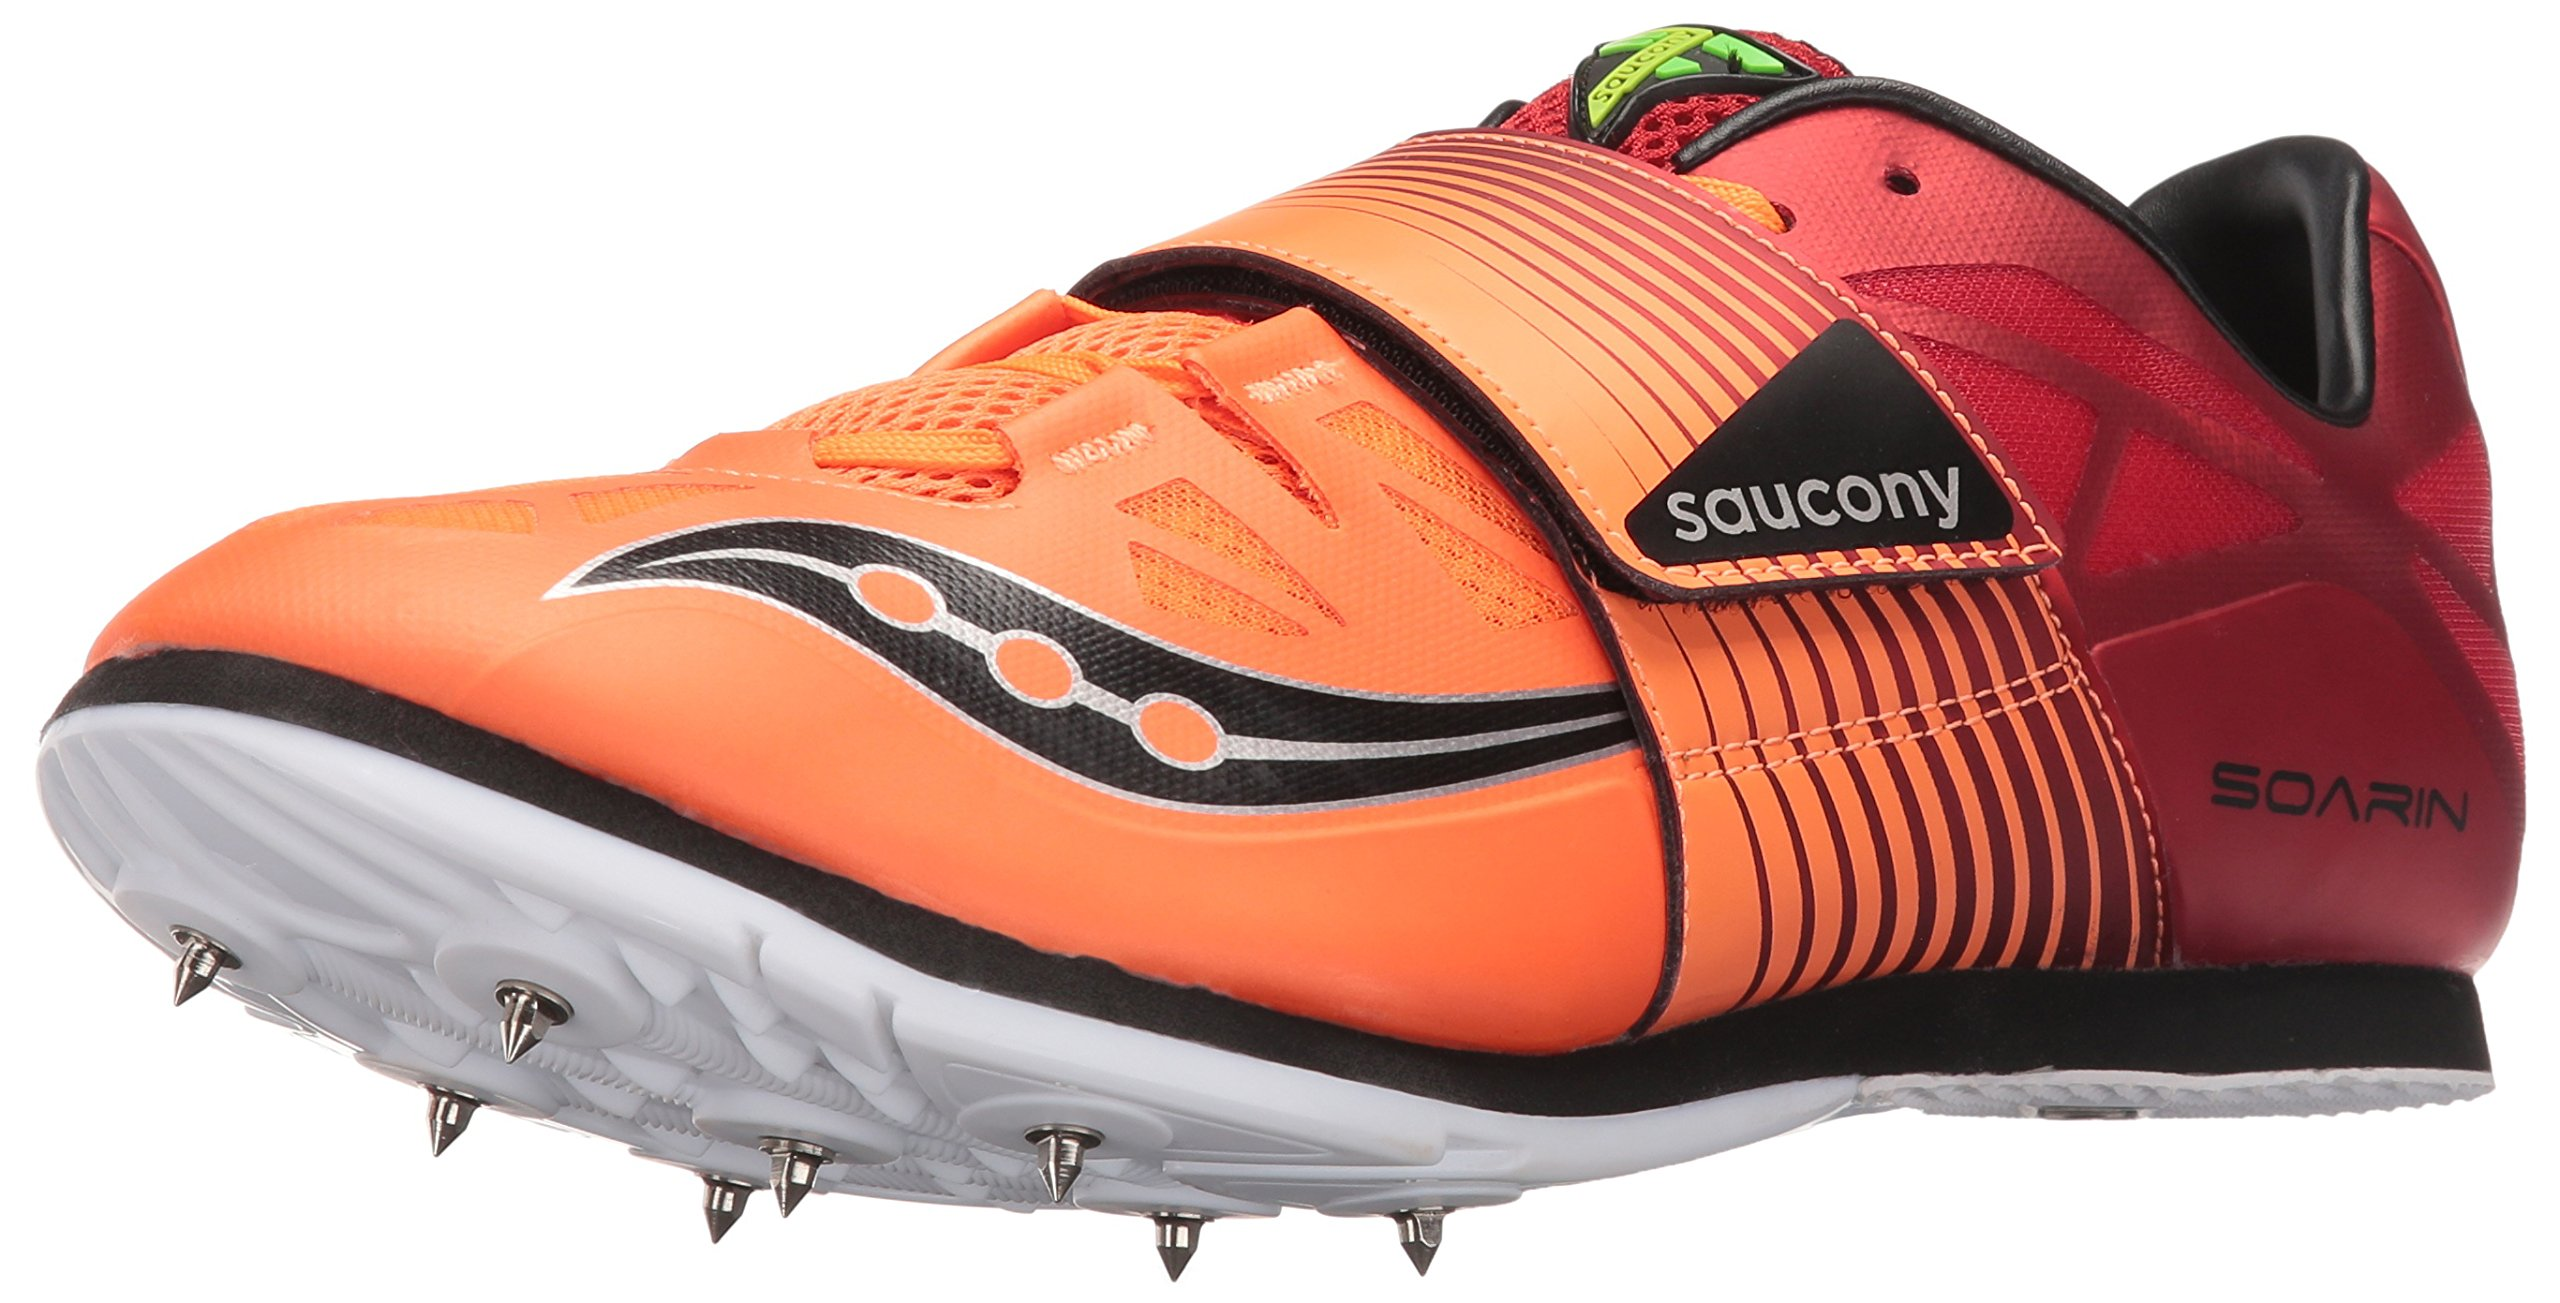 Saucony Men's Soarin j2 Track Shoe, Red/Vizi Orange, 10.5 M US